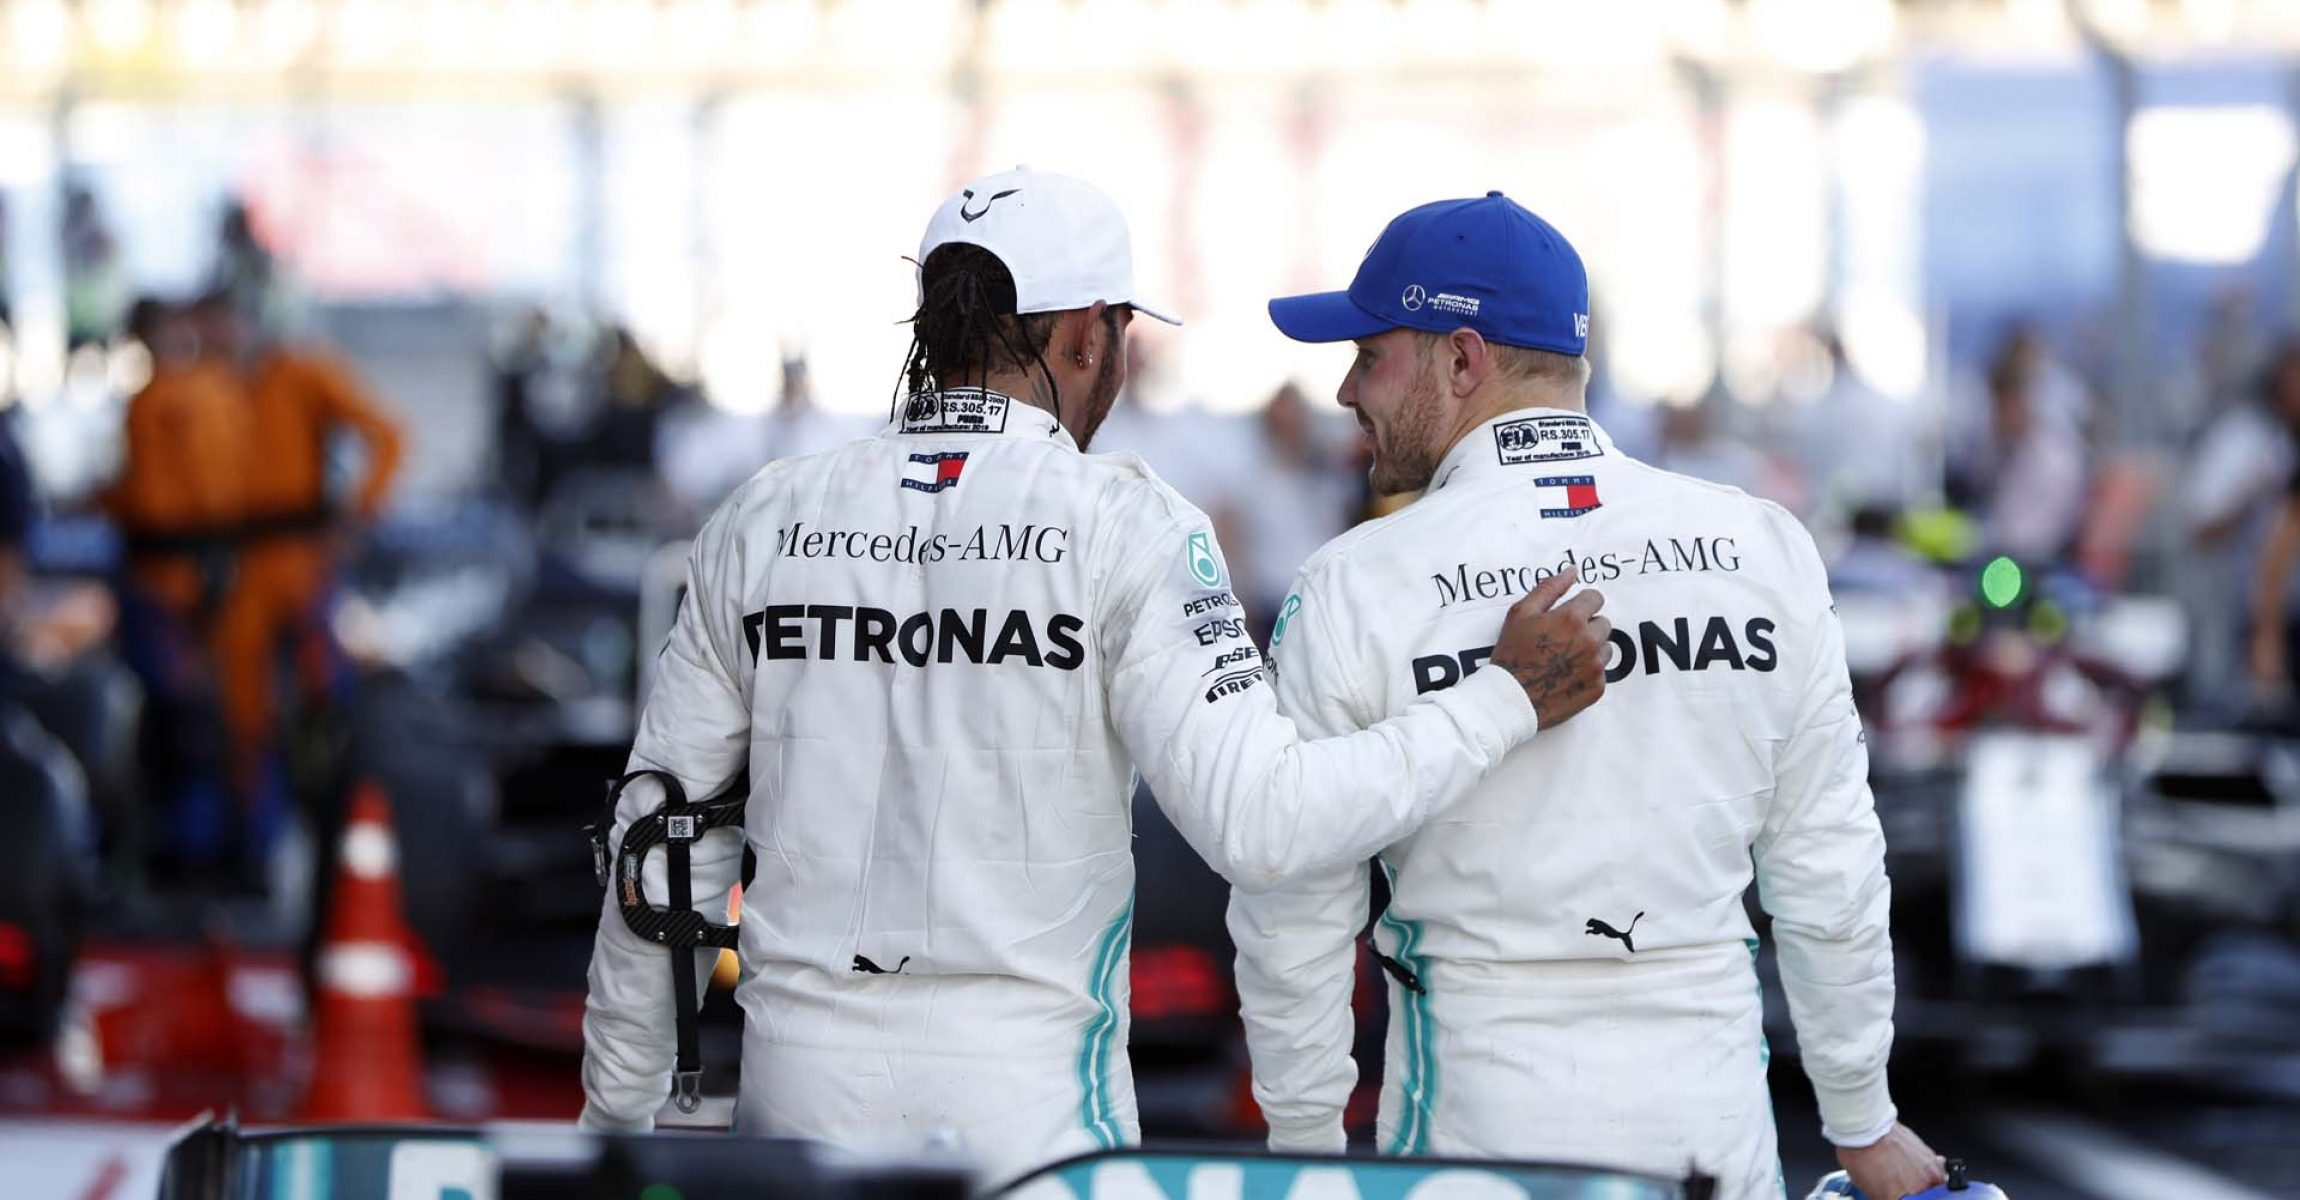 2019 Russian Grand Prix, Sunday - LAT Images Lewis Hamilton Valtteri Bottas Mercedes